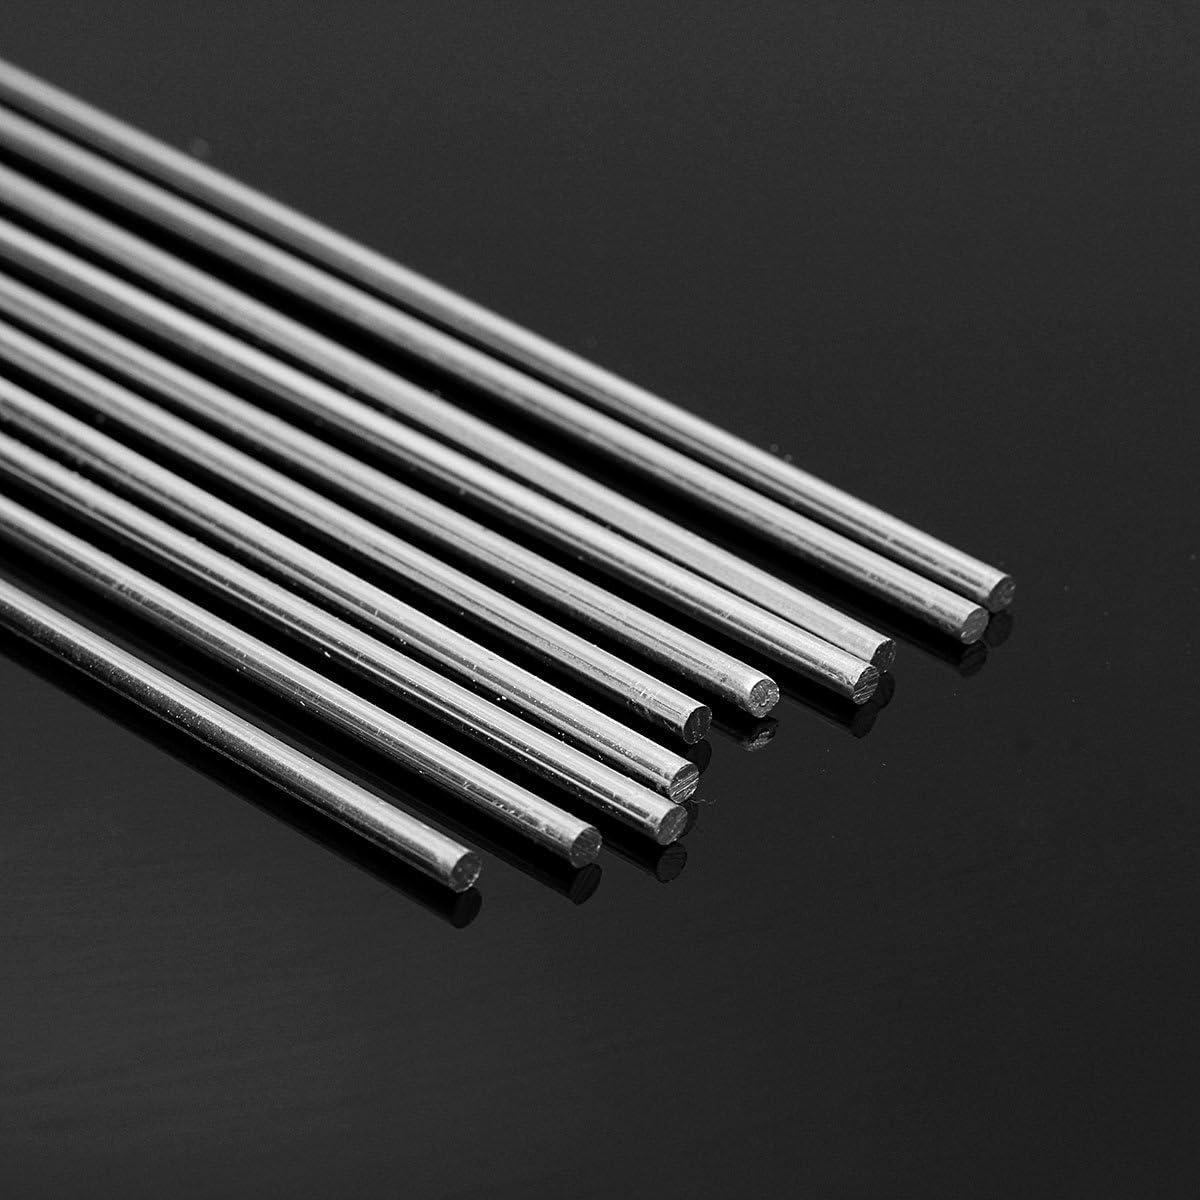 MASUNN 10Pcs 1.6 X330Mm Aleación De Aluminio Soldadura Plat